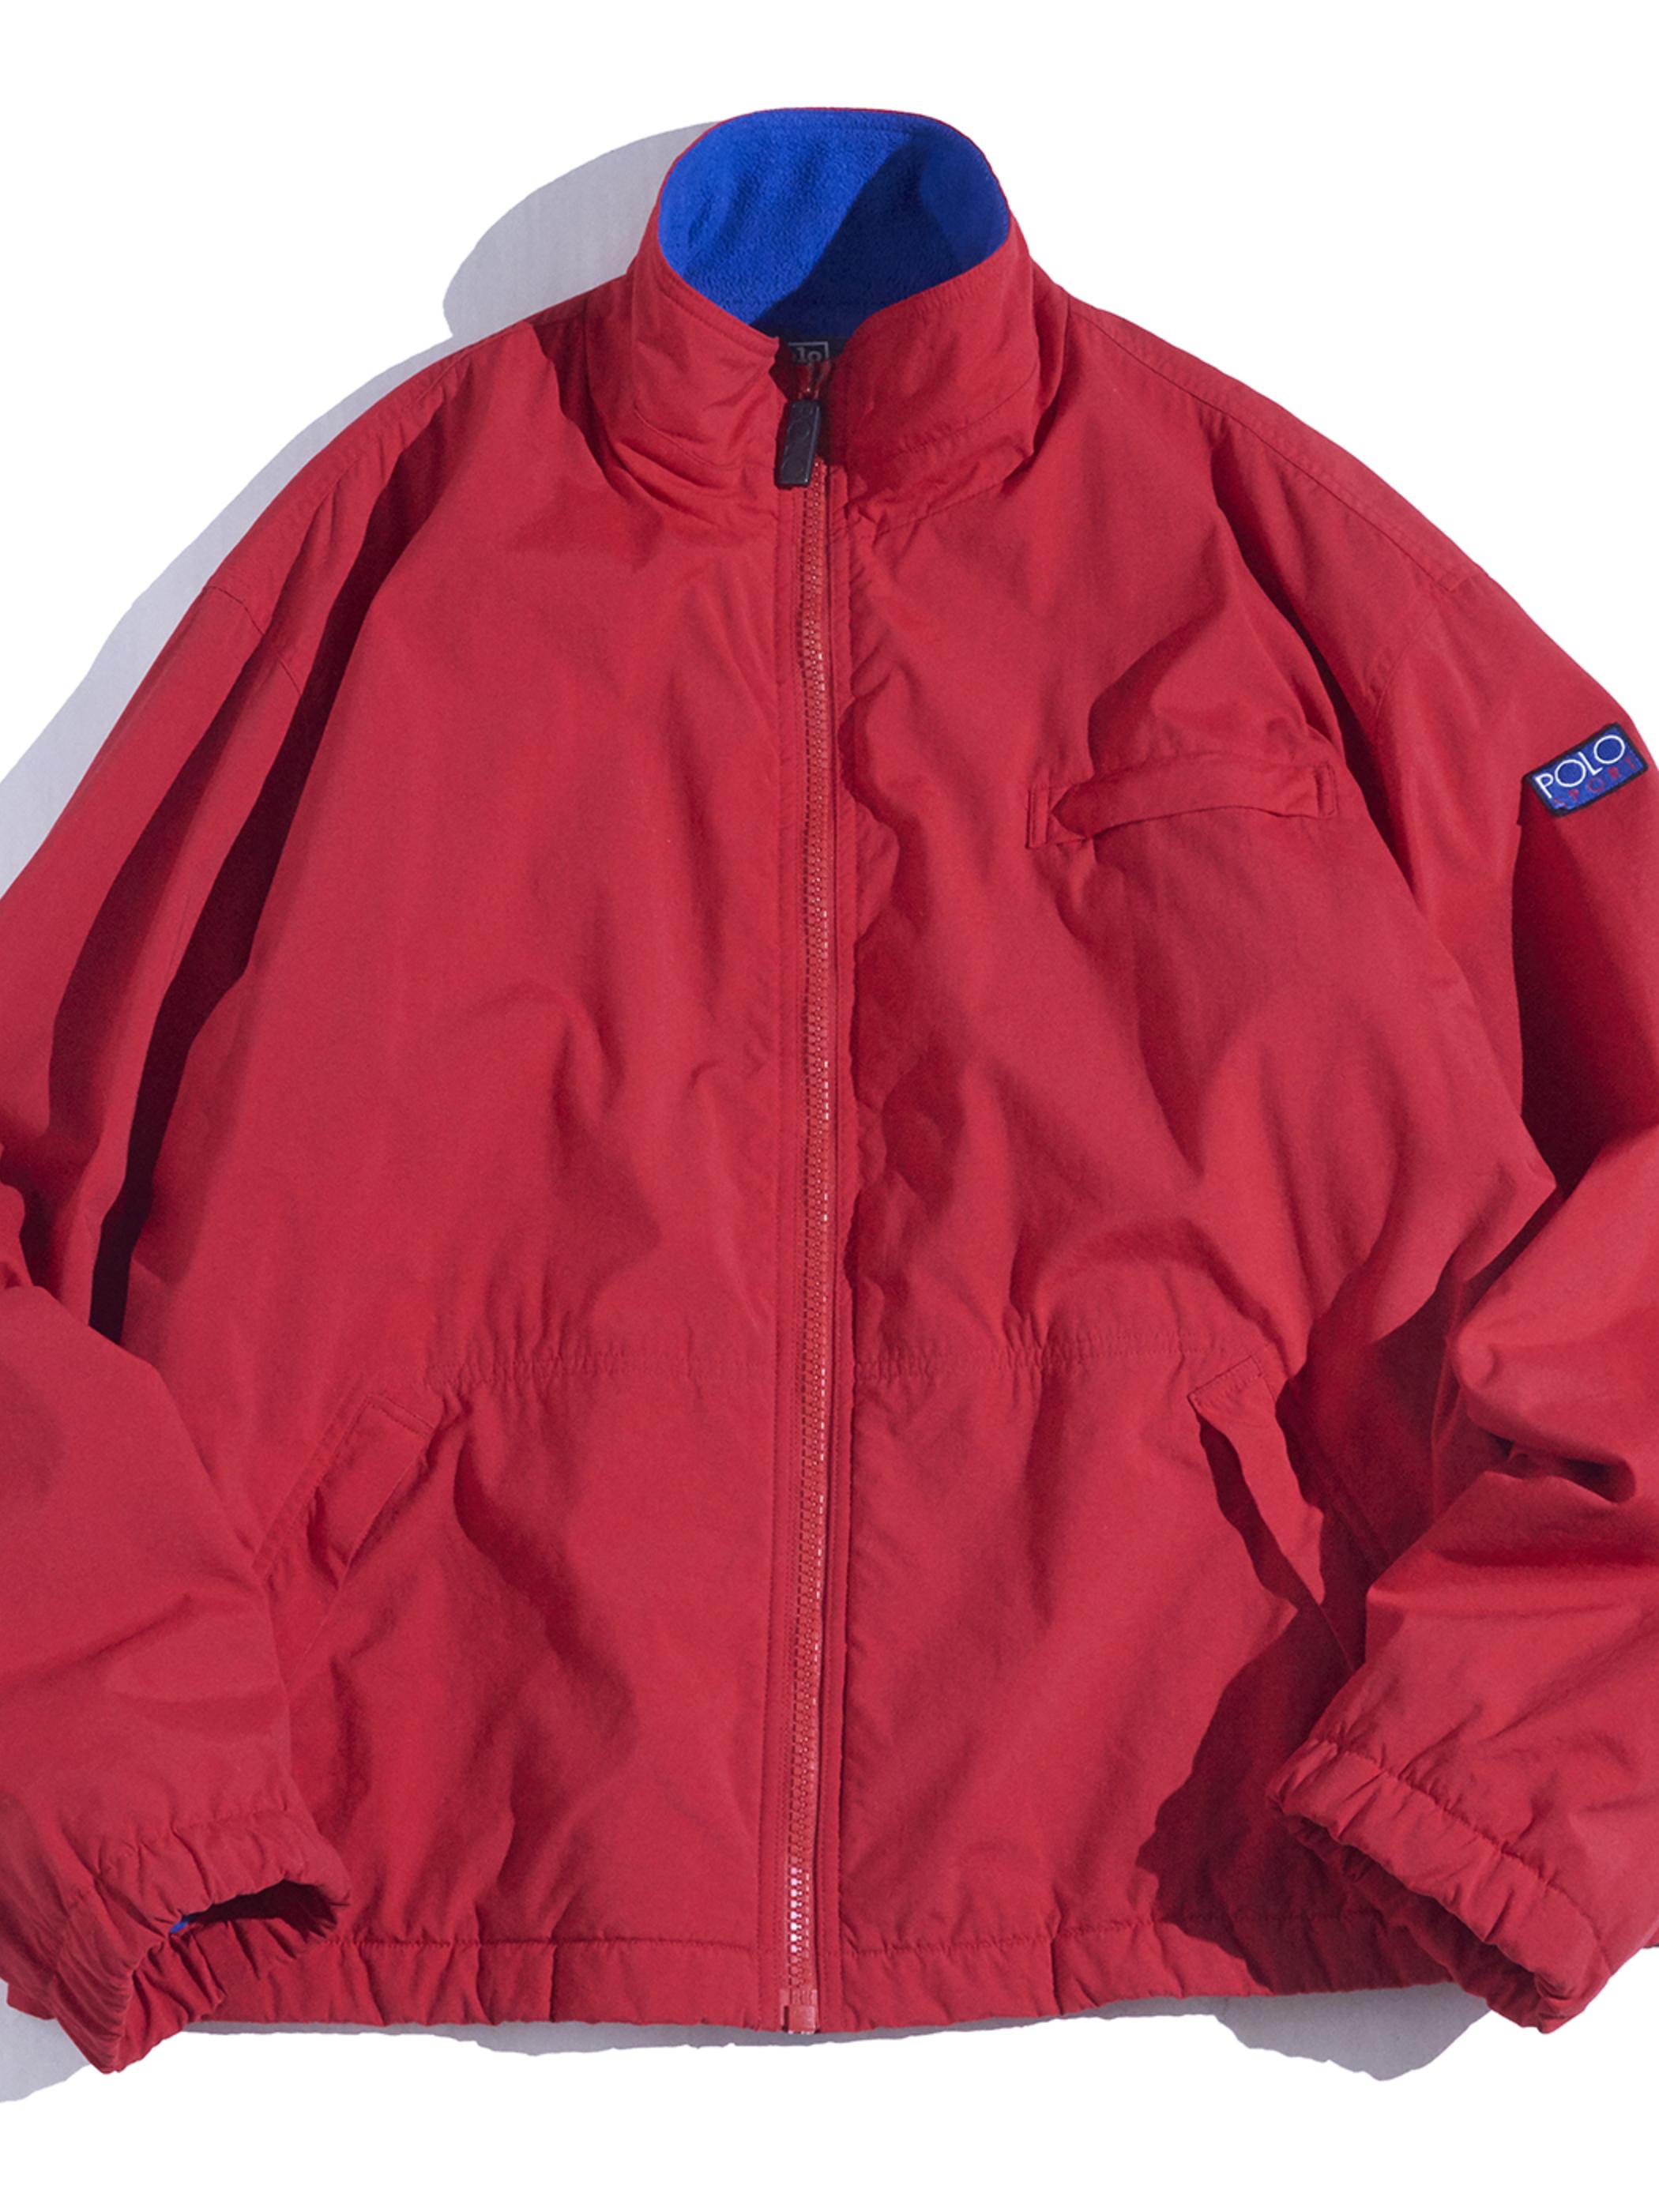 "1990s ""POLO by Ralph Lauren"" nylon/fleece lined jacket -RED-"